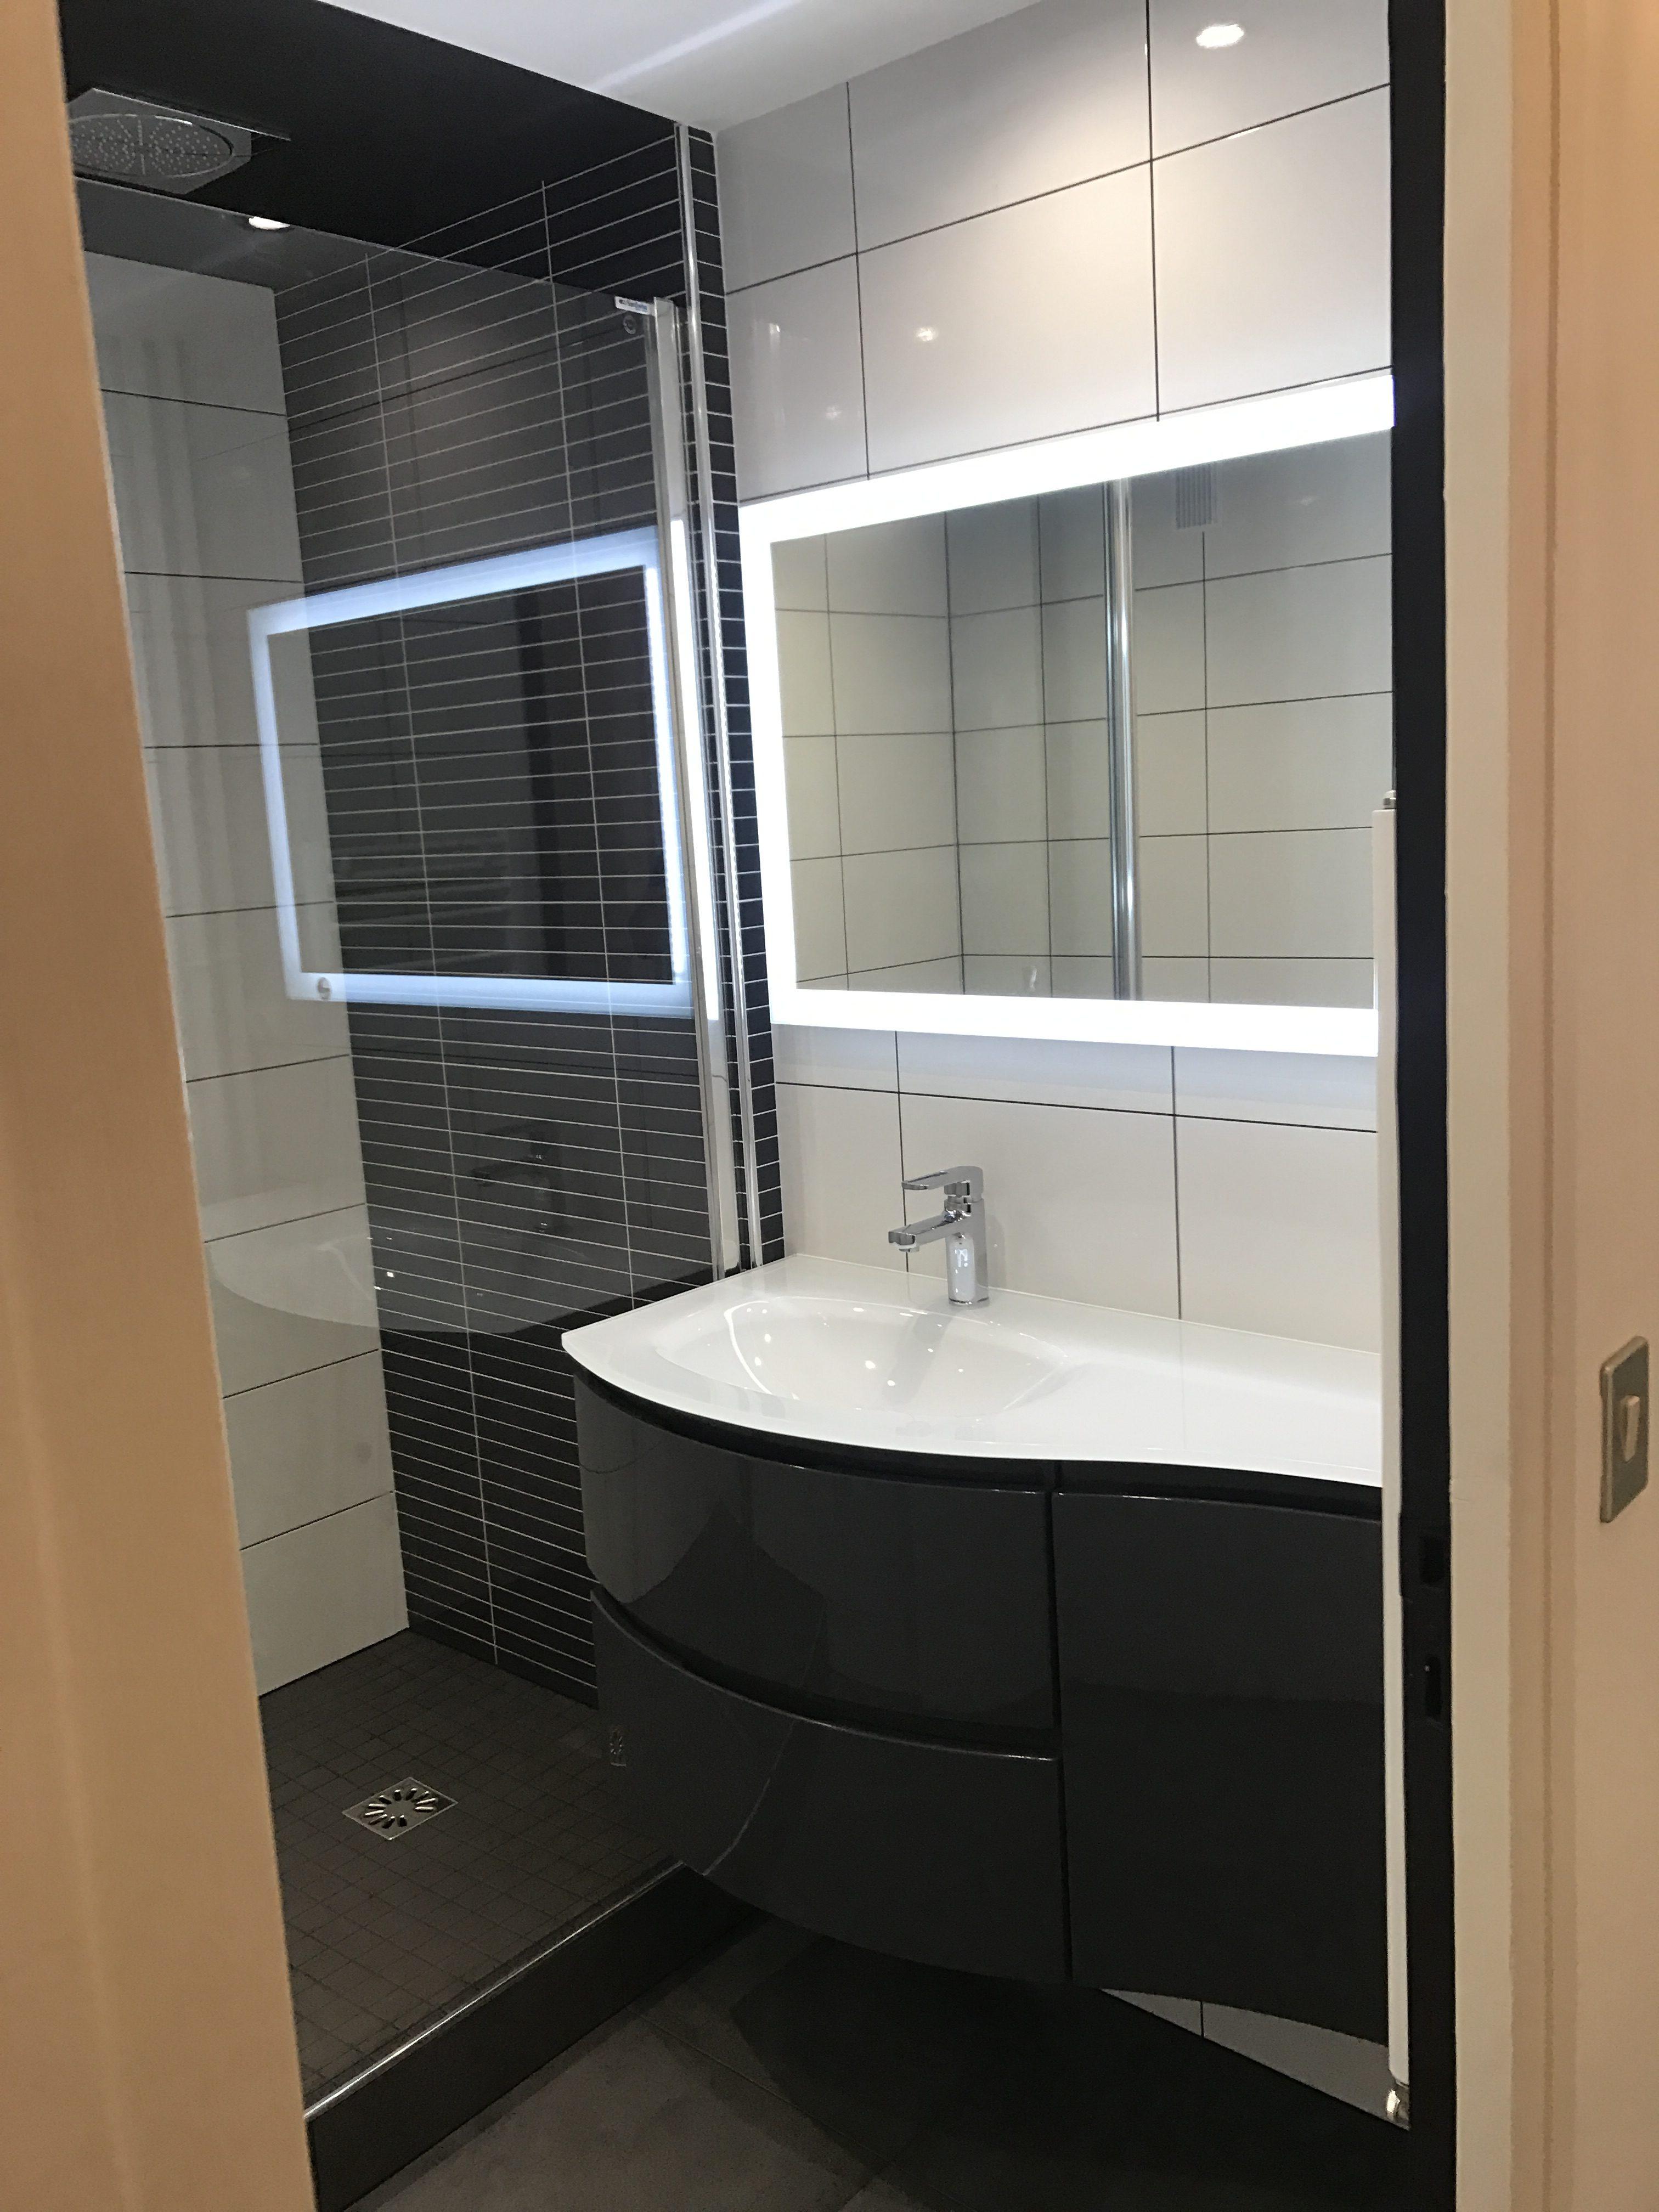 realisation-salle-de-bain-lcrdp-renovation-orleans-4